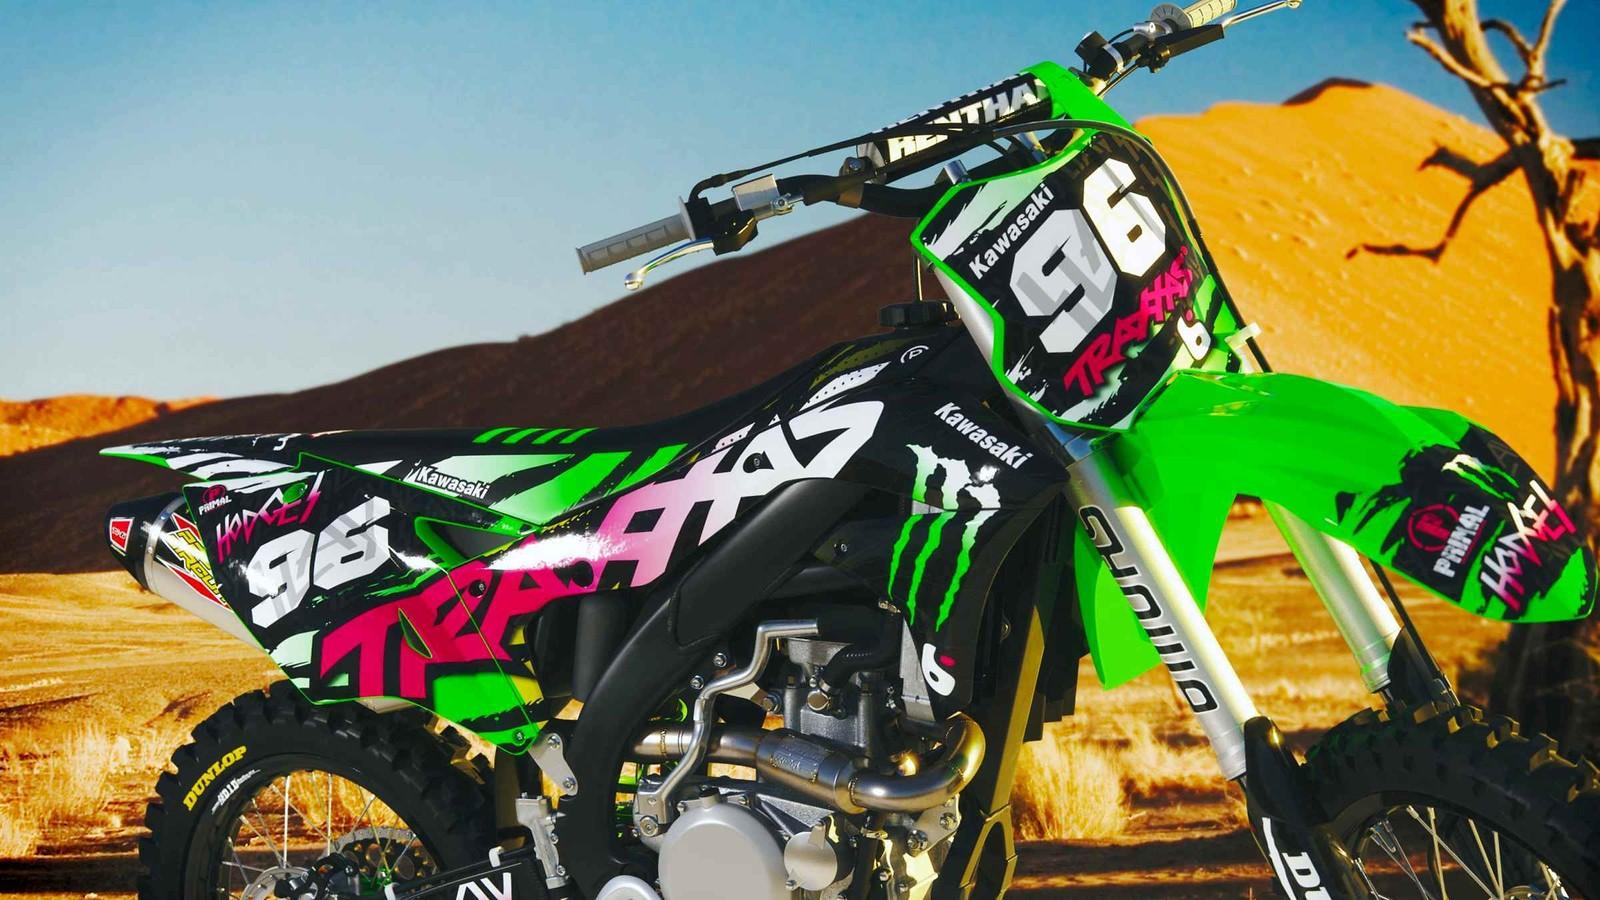 Primal X Motorsports - MX - Graphics - Motocross - Axell Hodges 1 - PRIMAL_X_MOTORSPORTS - Motocross Pictures - Vital MX